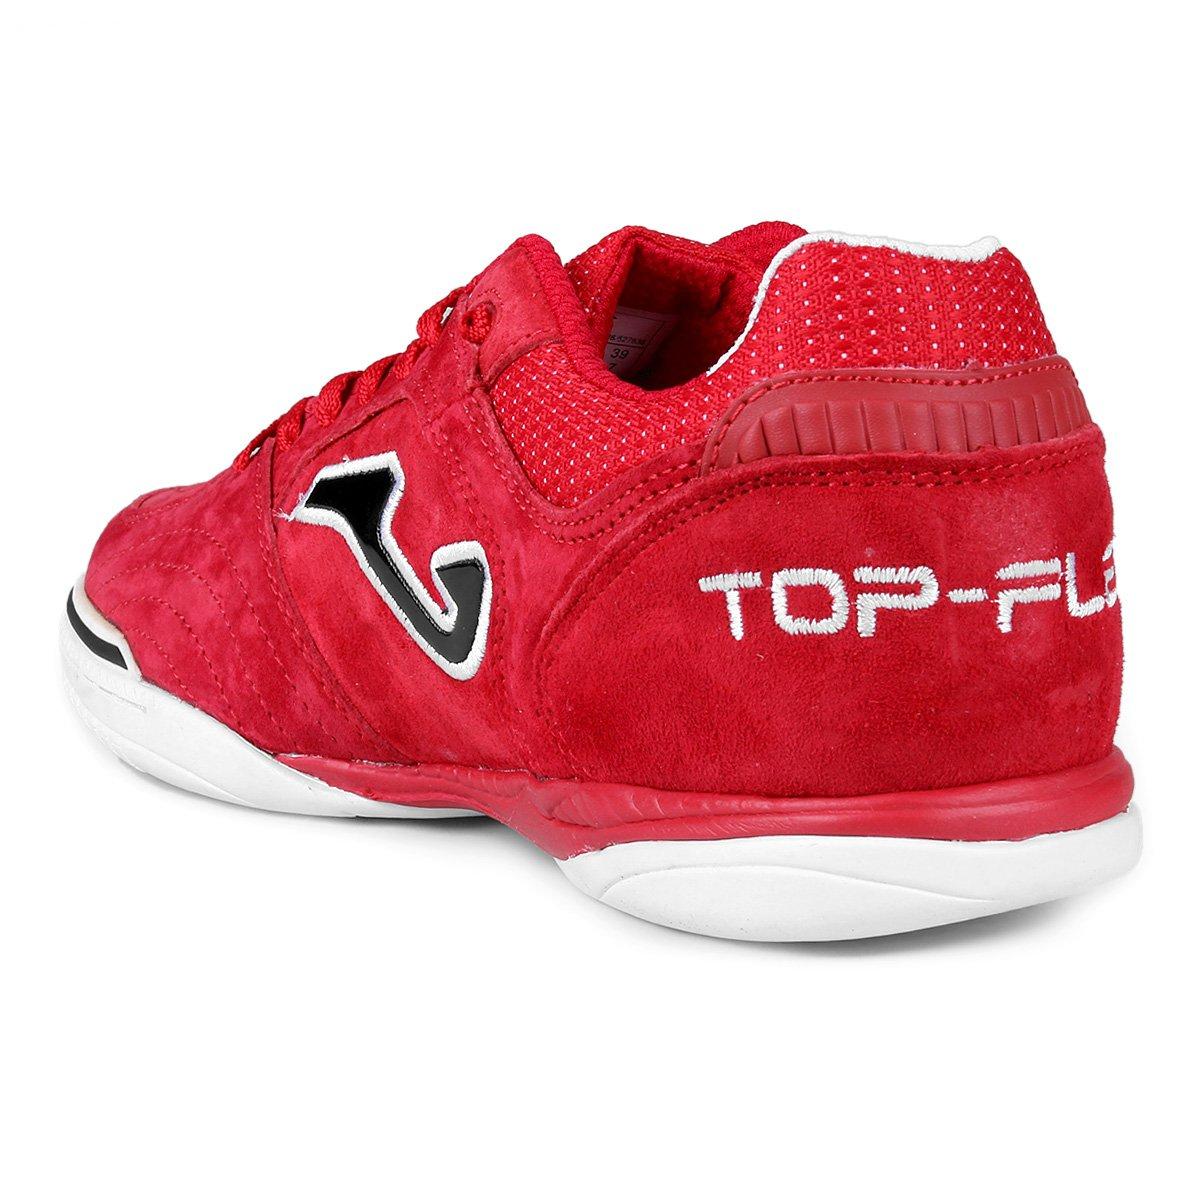 463e29c5a8 Chuteira Futsal Joma Top Flex - Tam  44 - Shopping TudoAzul